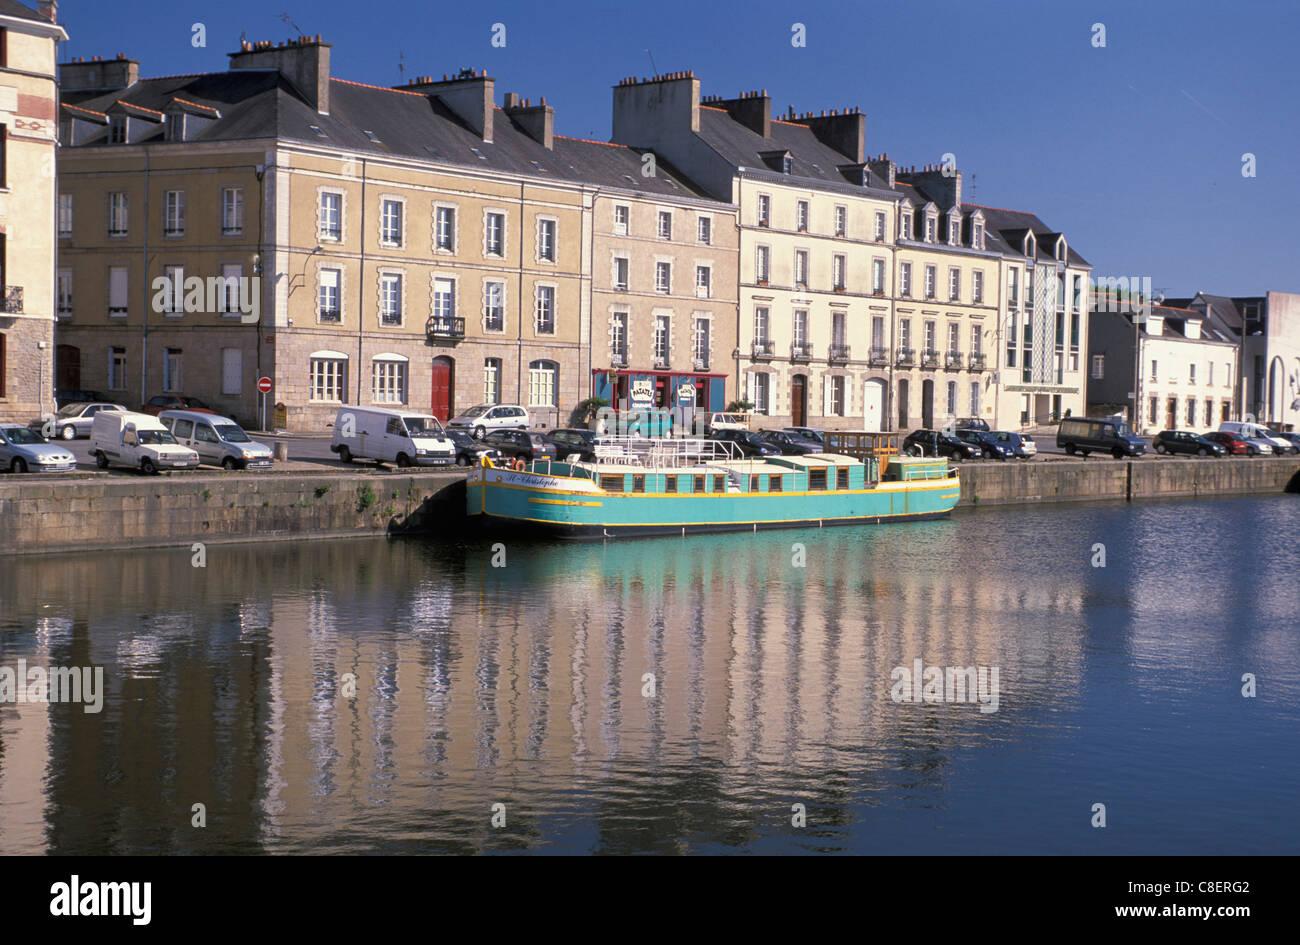 Old Harbor, harbour, Quarter, Quartier de Vieux Port, Redon, Brittany, Bretagne, France, Europe, boat - Stock Image